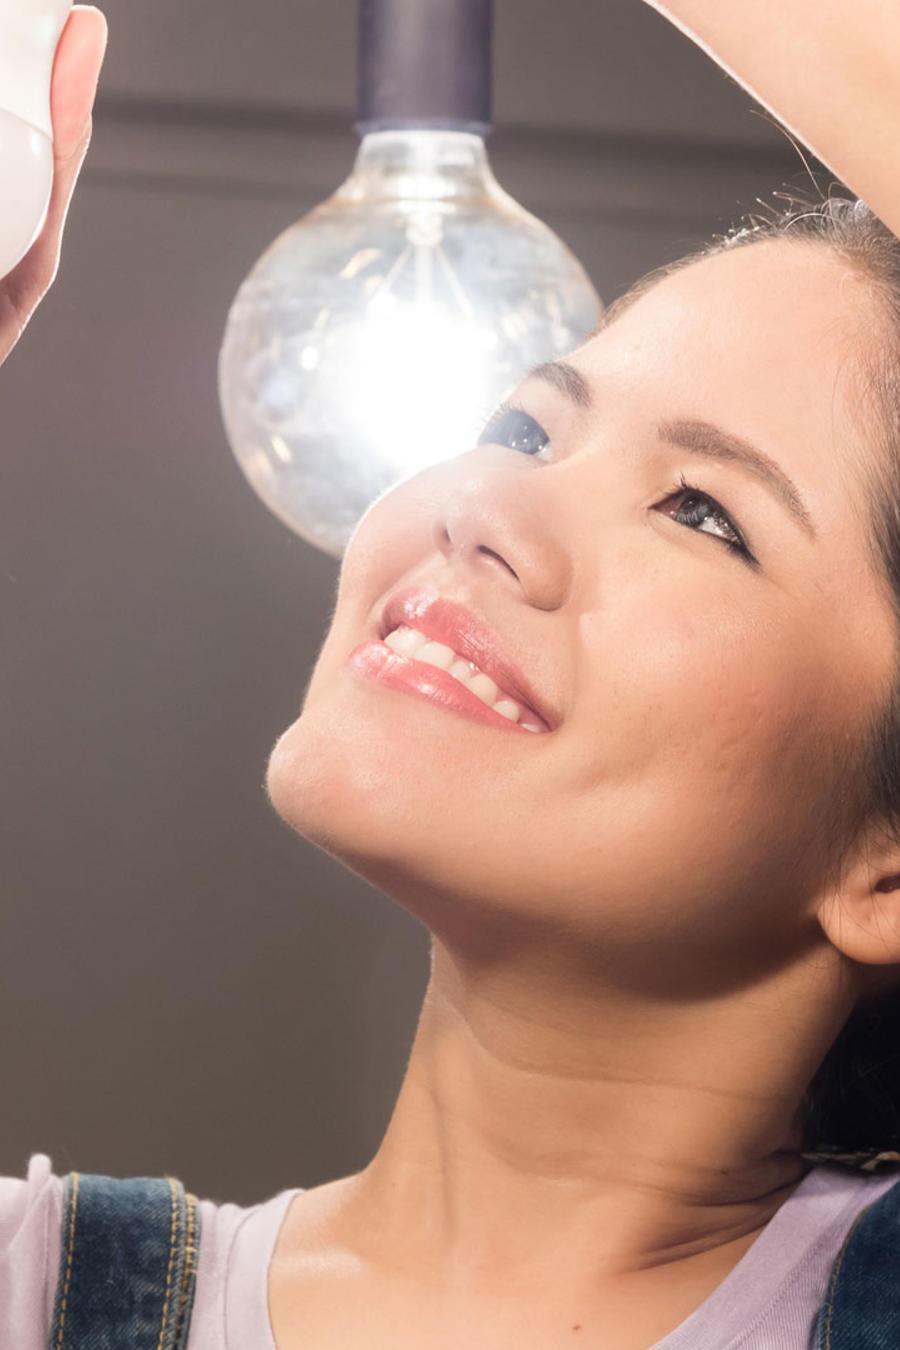 Mujer cambiando bombillas